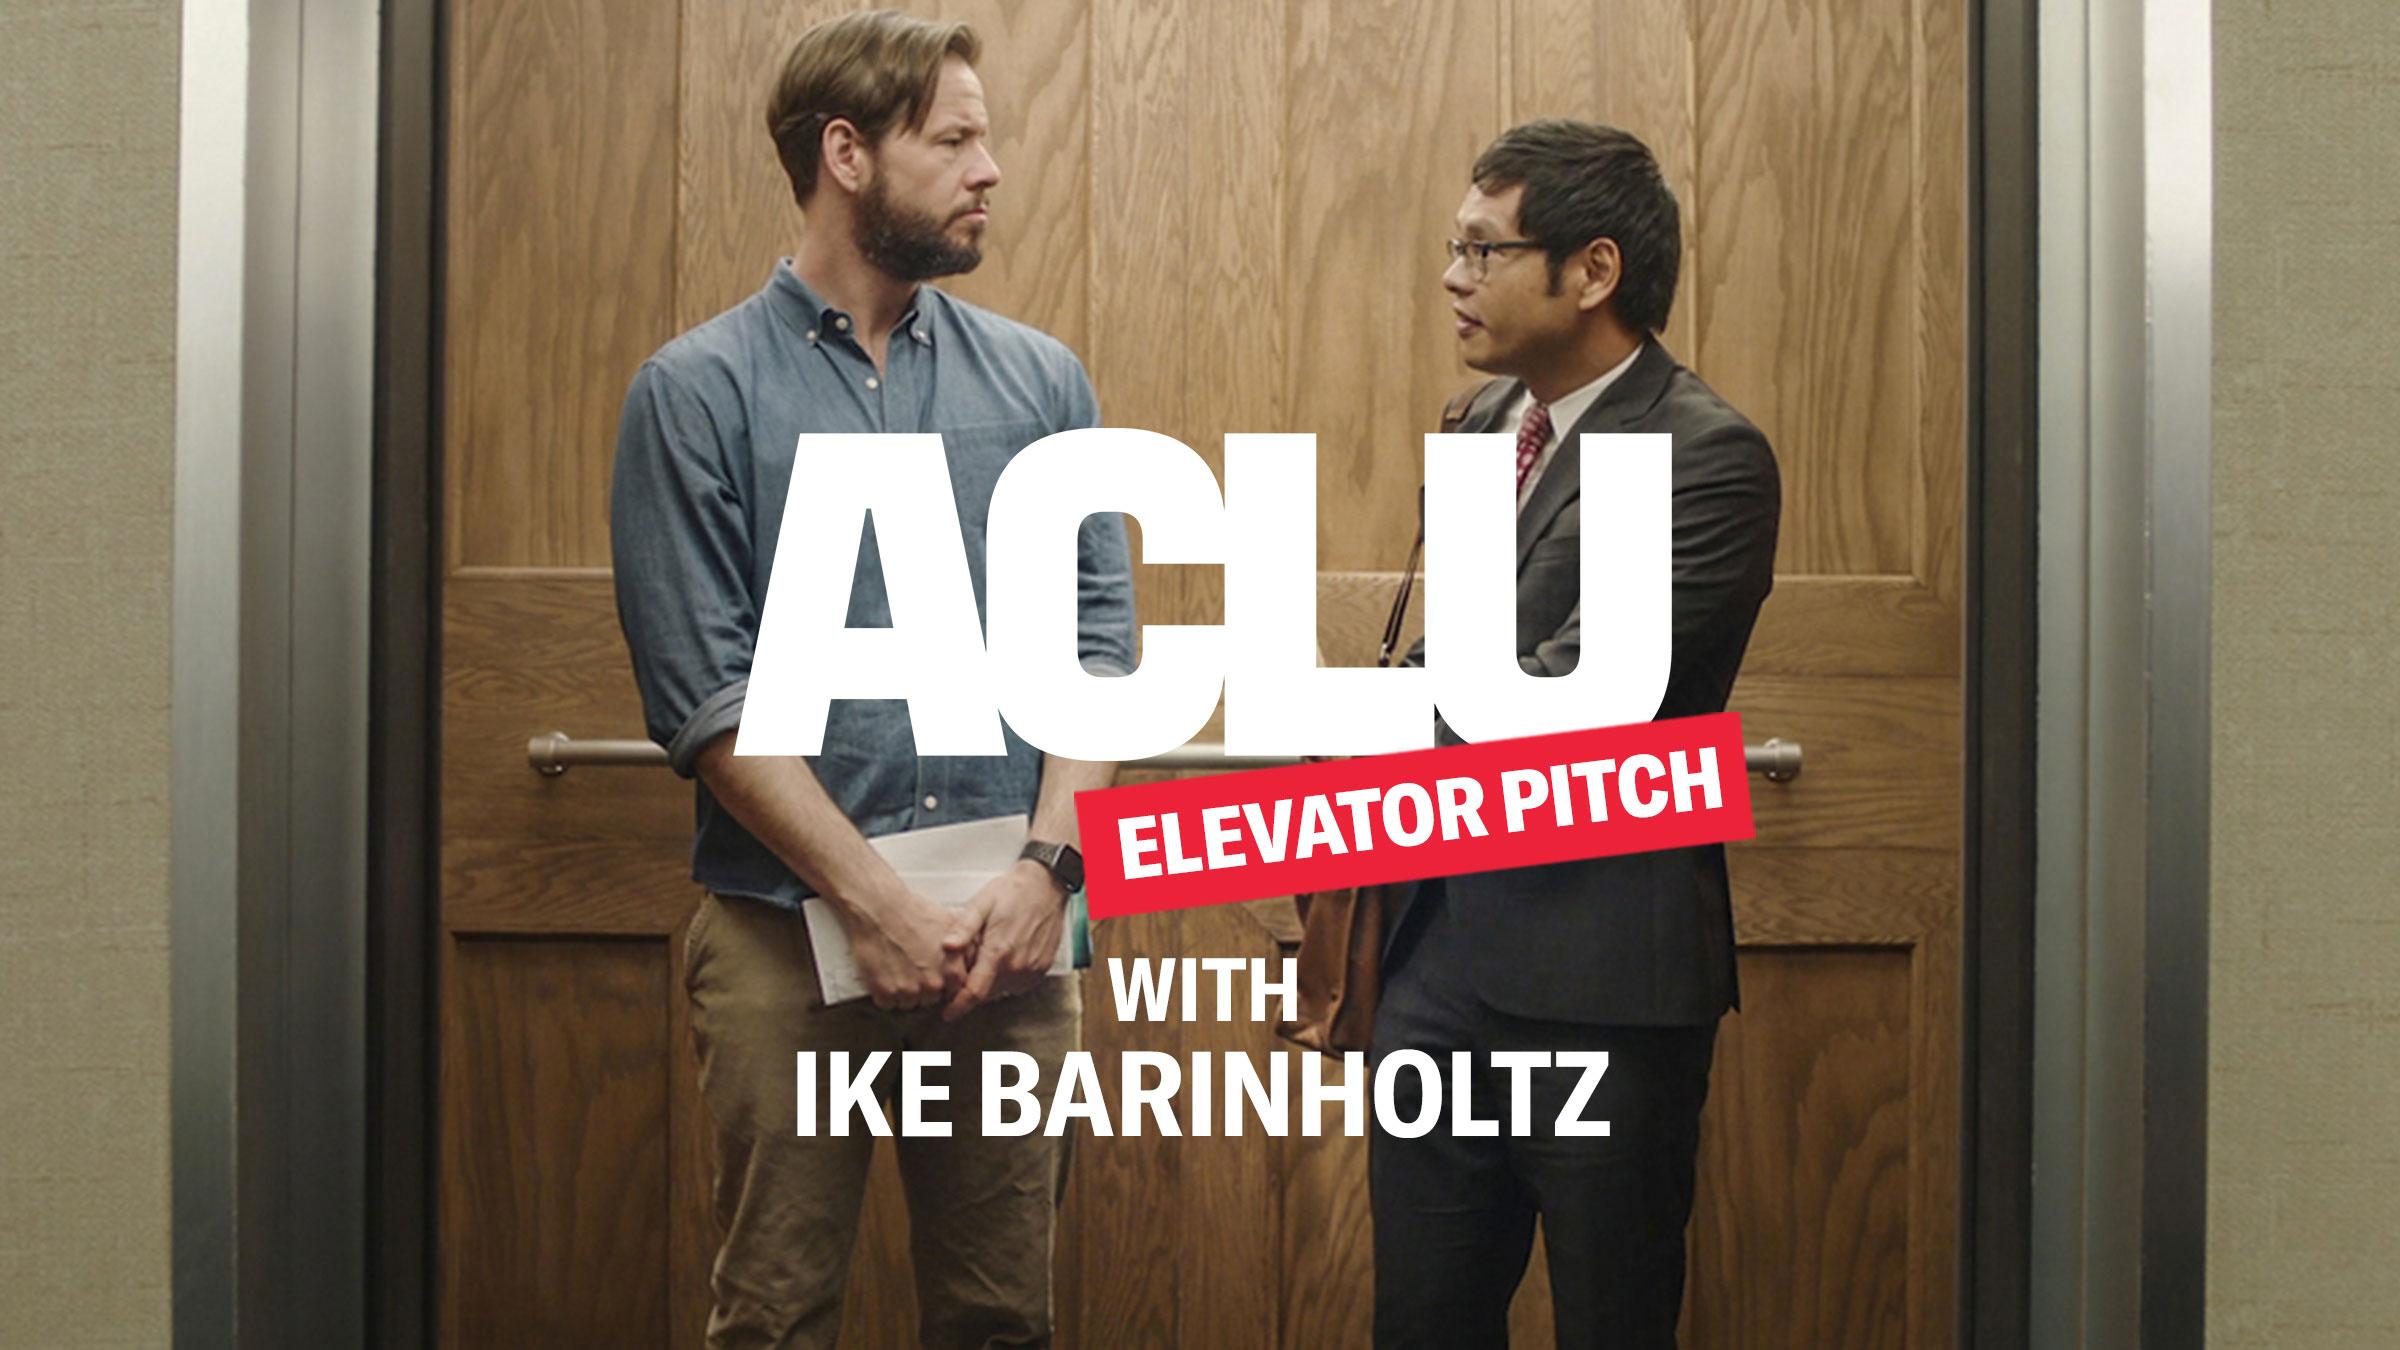 ACLU Elevator Pitch: 2020 Census With Ike Barinholtz